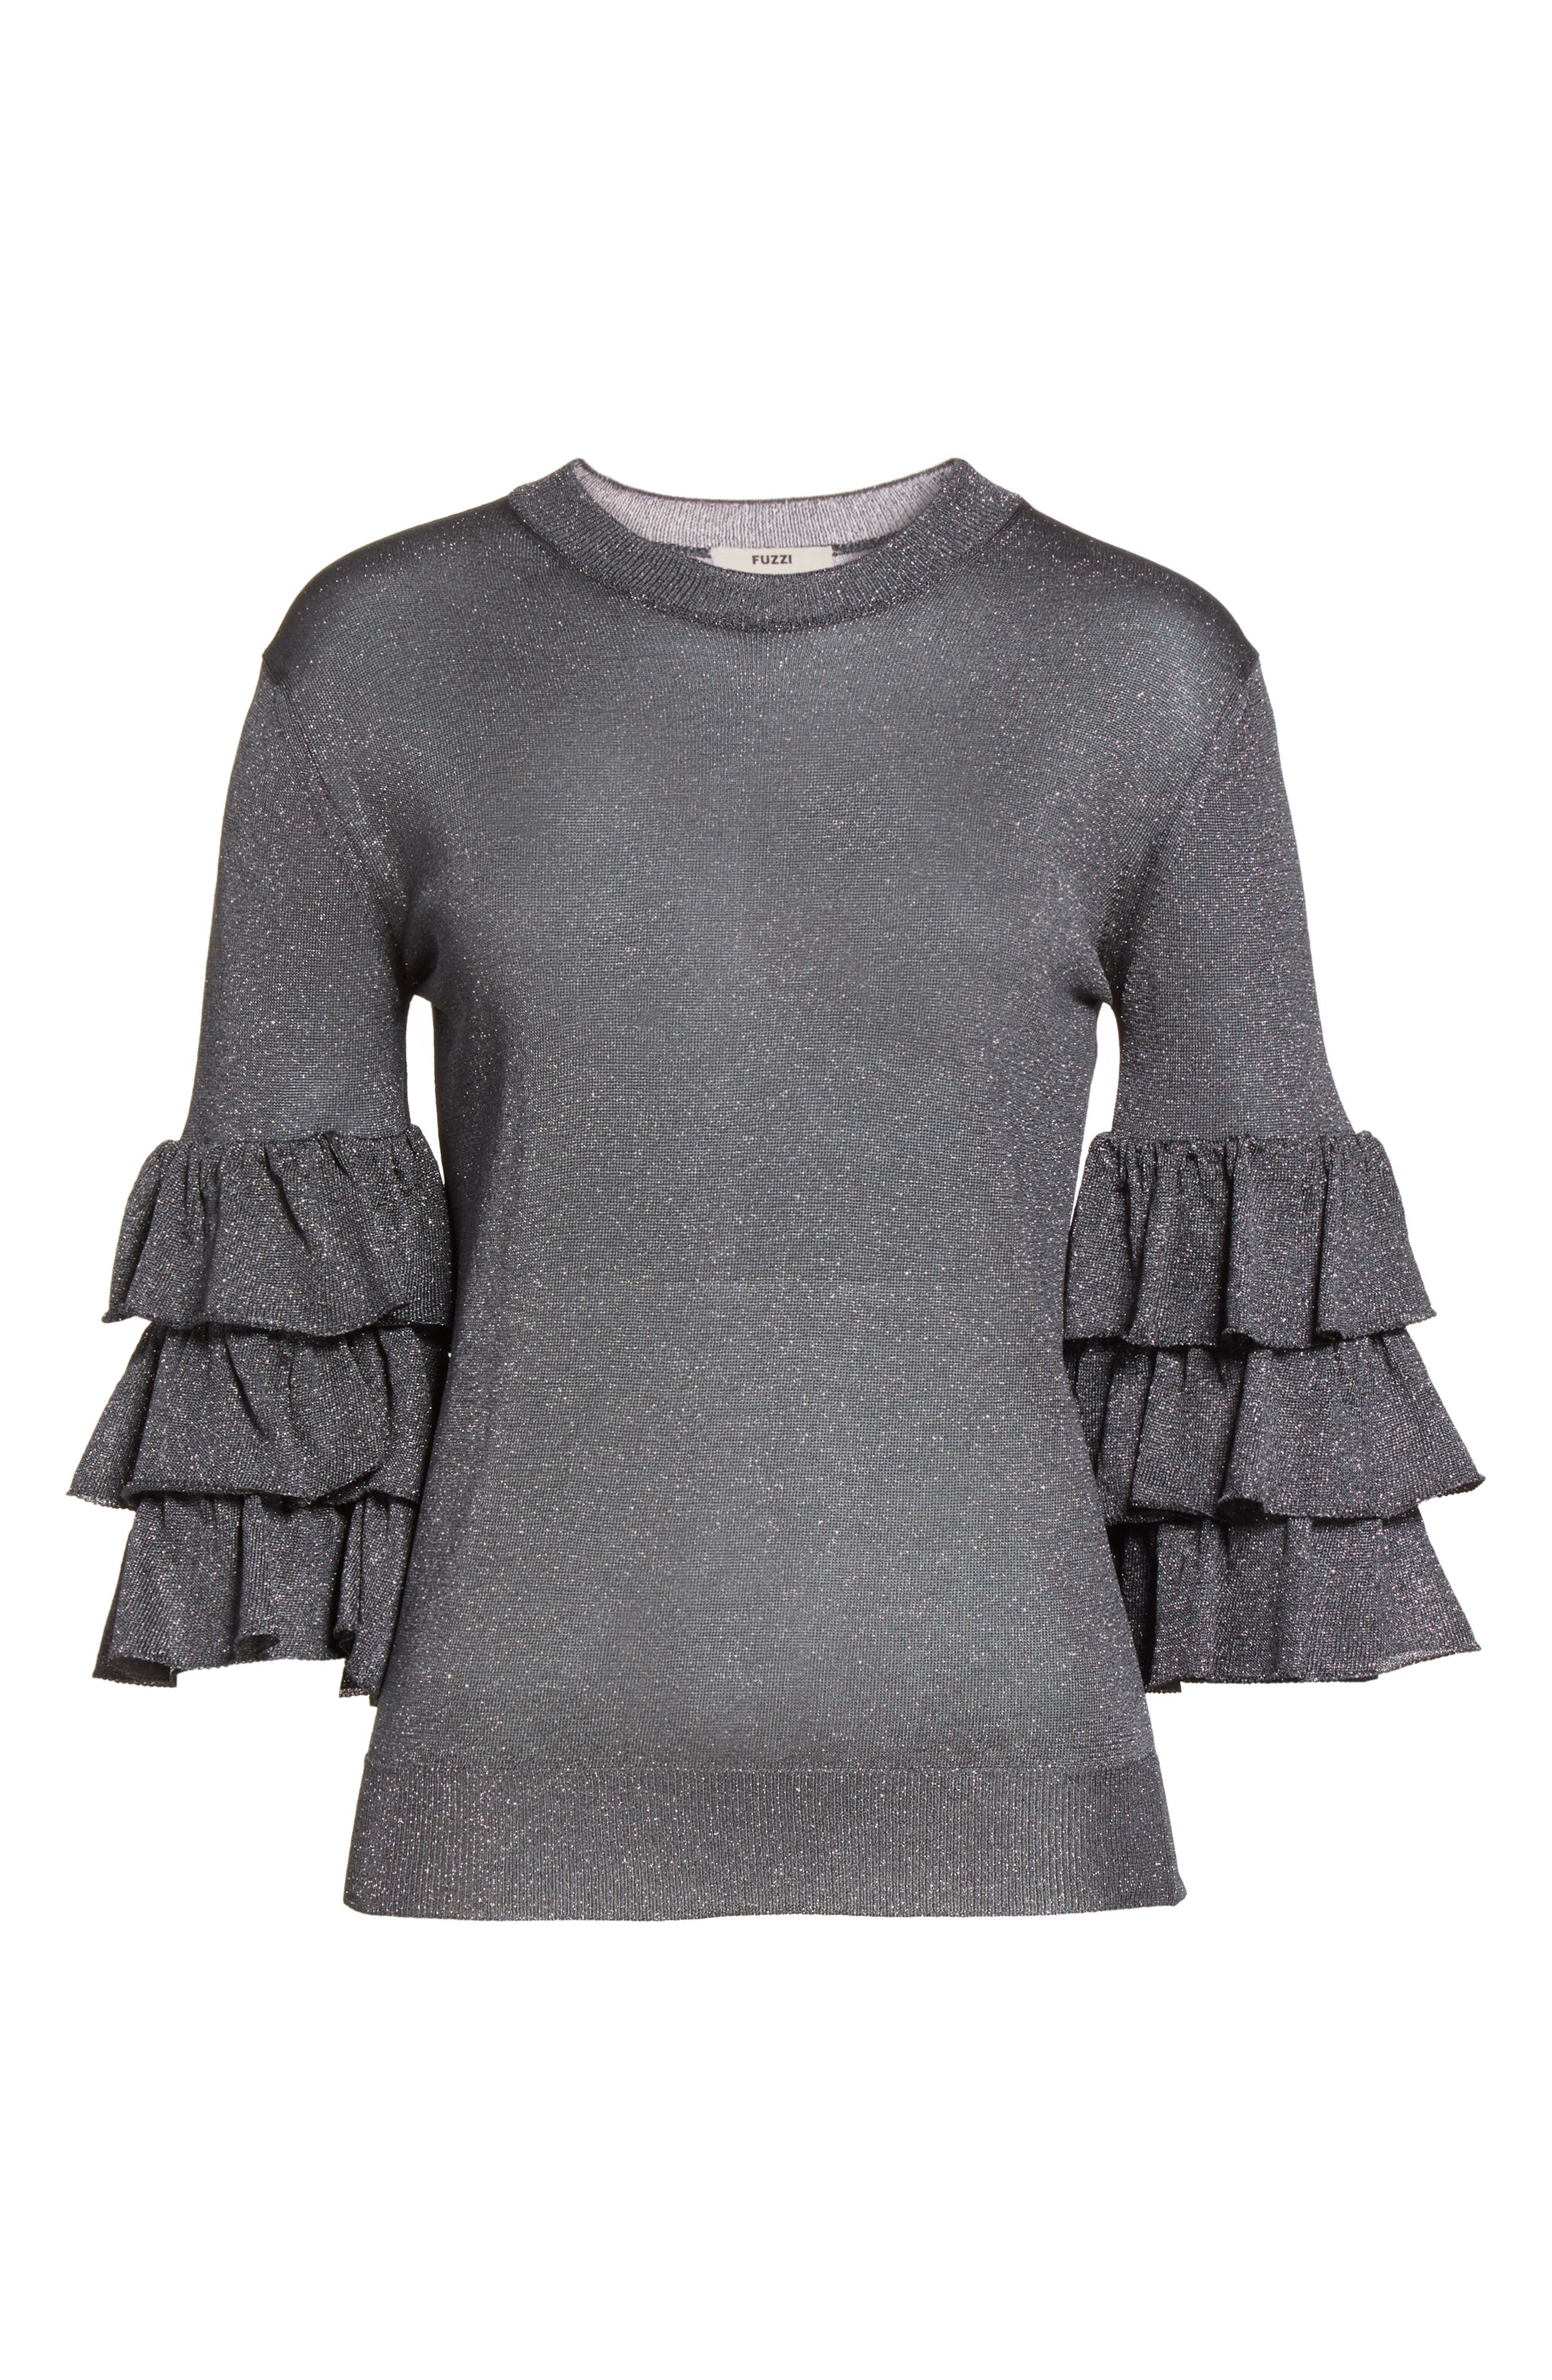 Tiered Ruffle Sleeve Metallic Top,                             Alternate thumbnail 6, color,                             020